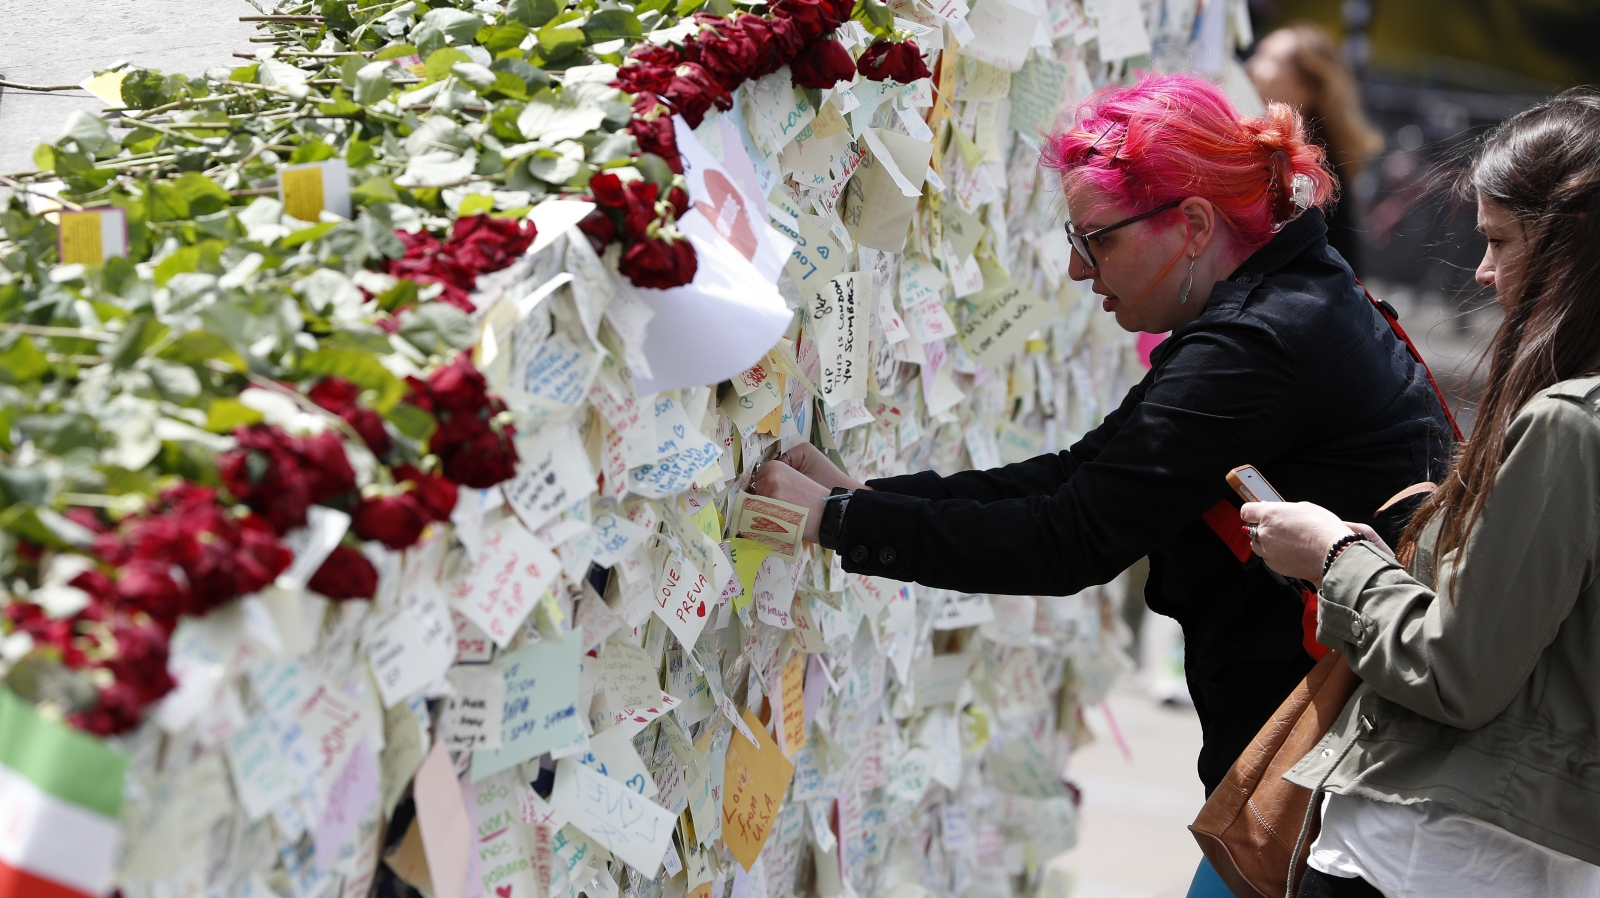 Britain braced for renewed terrorist attacks in 2018